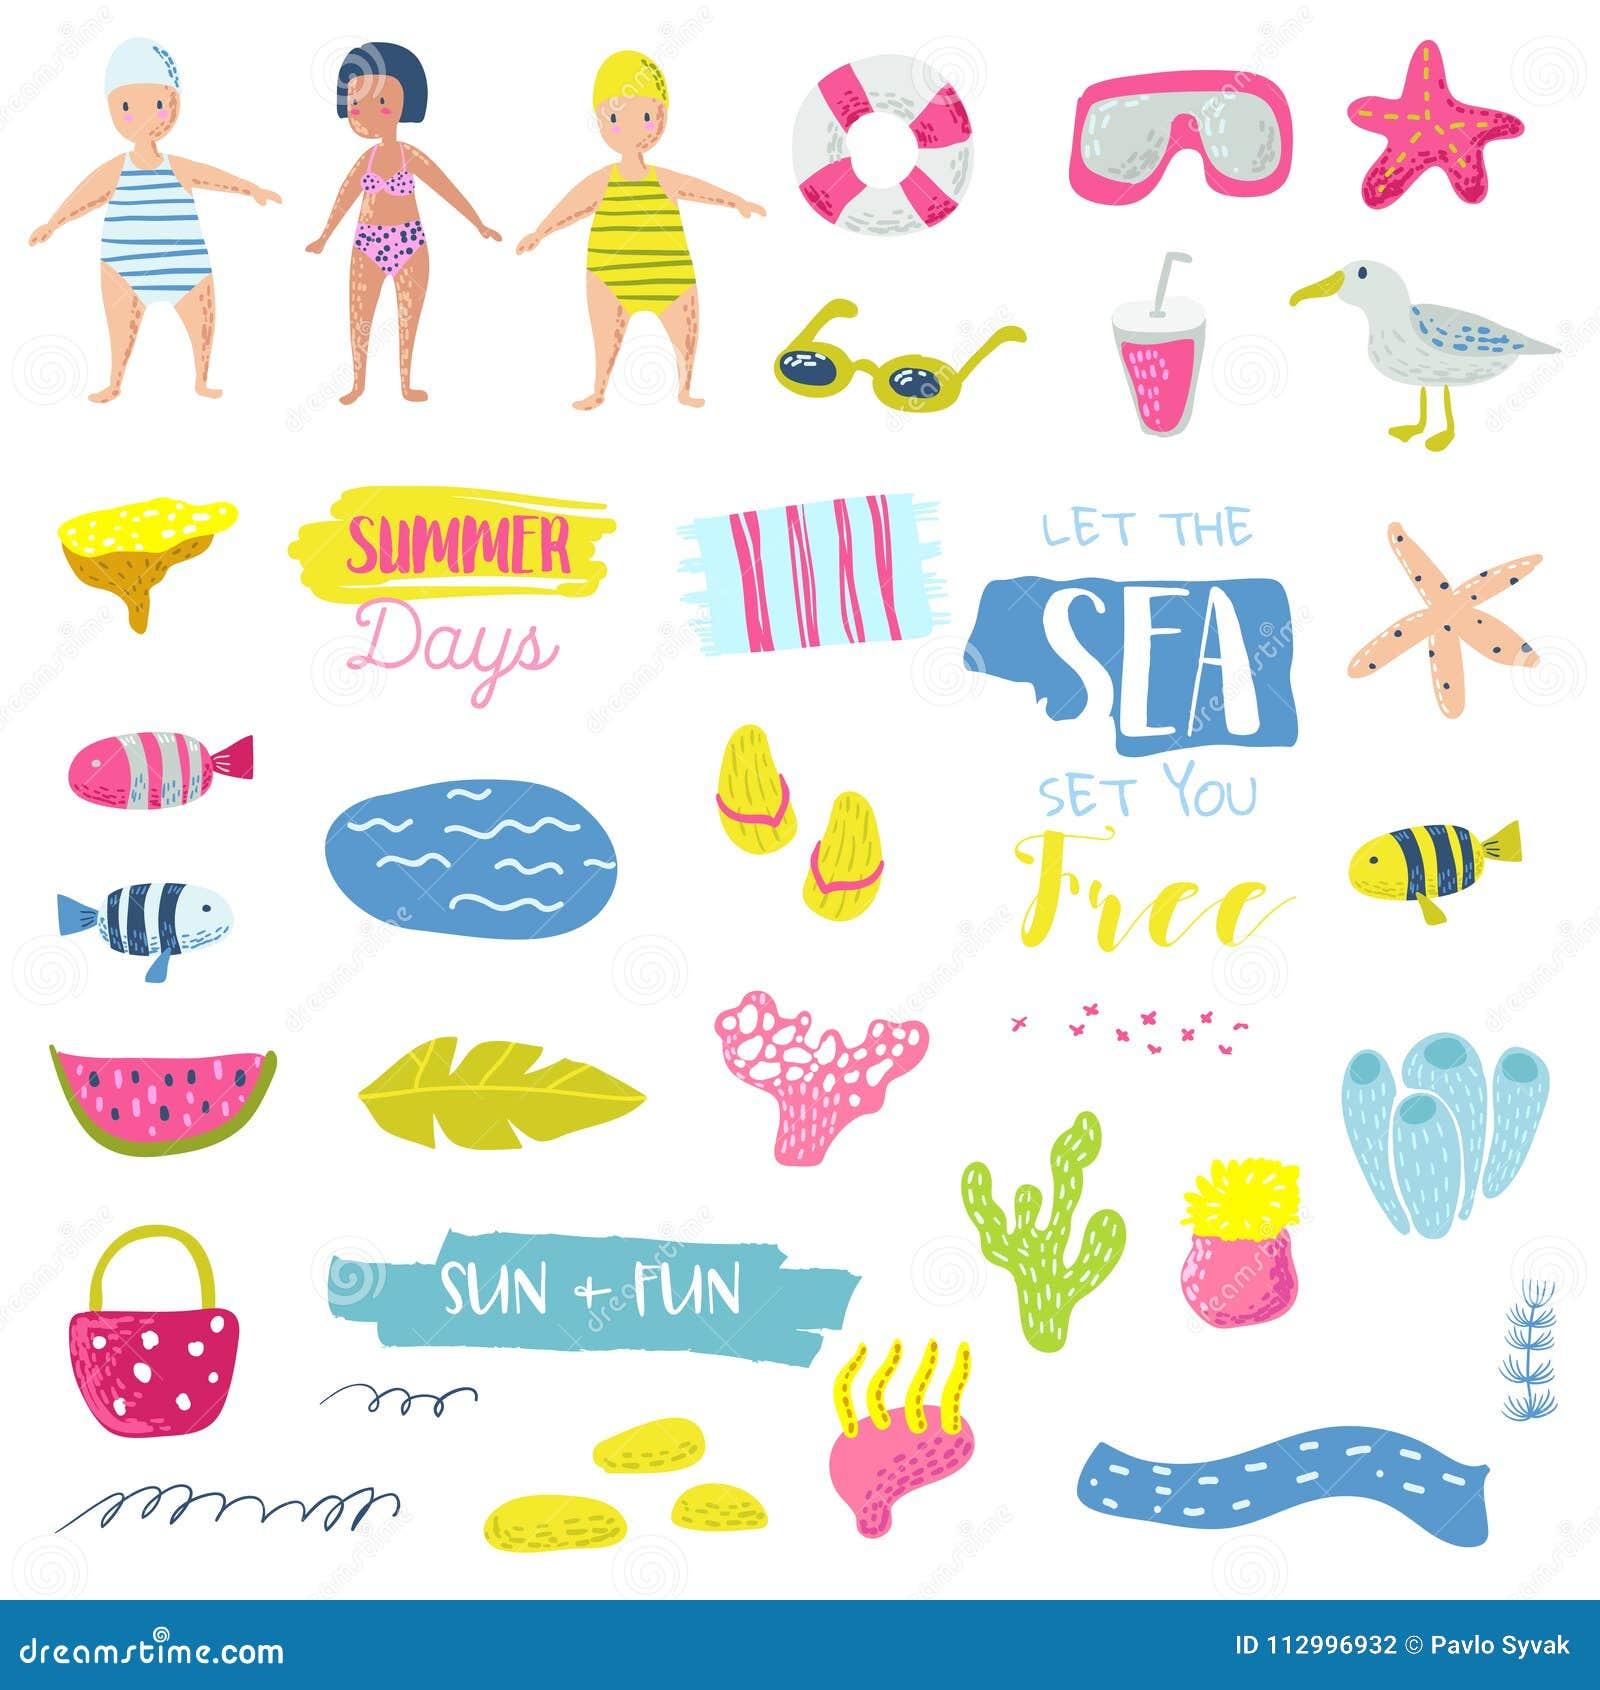 Summer Beach Vacation Childish Elements Set With Kids, Fish